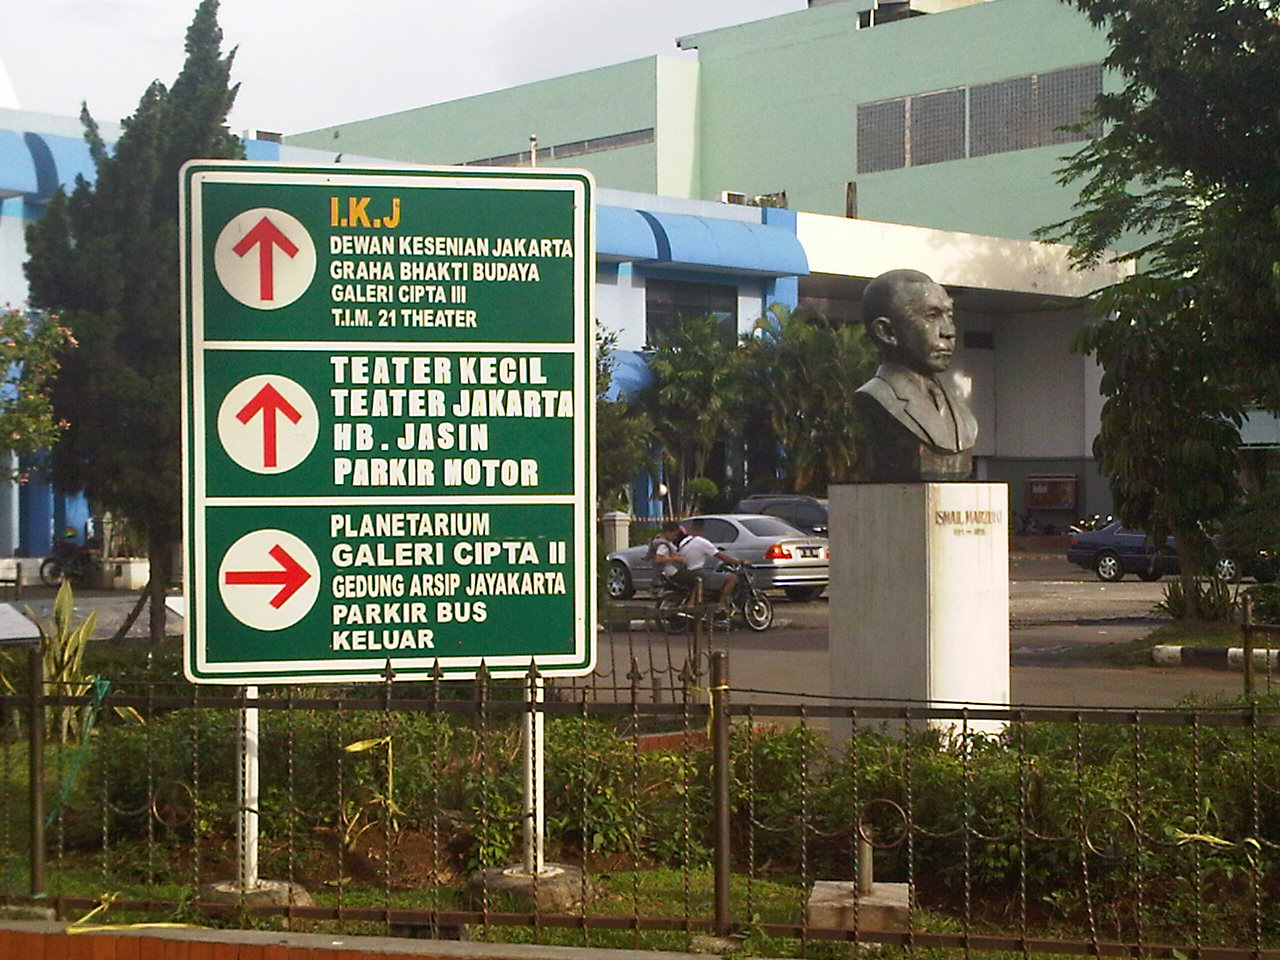 Visi Anies Sandi Kesenian Jakarta Musical Promenade Menyelenggarakan Festival Olahraga